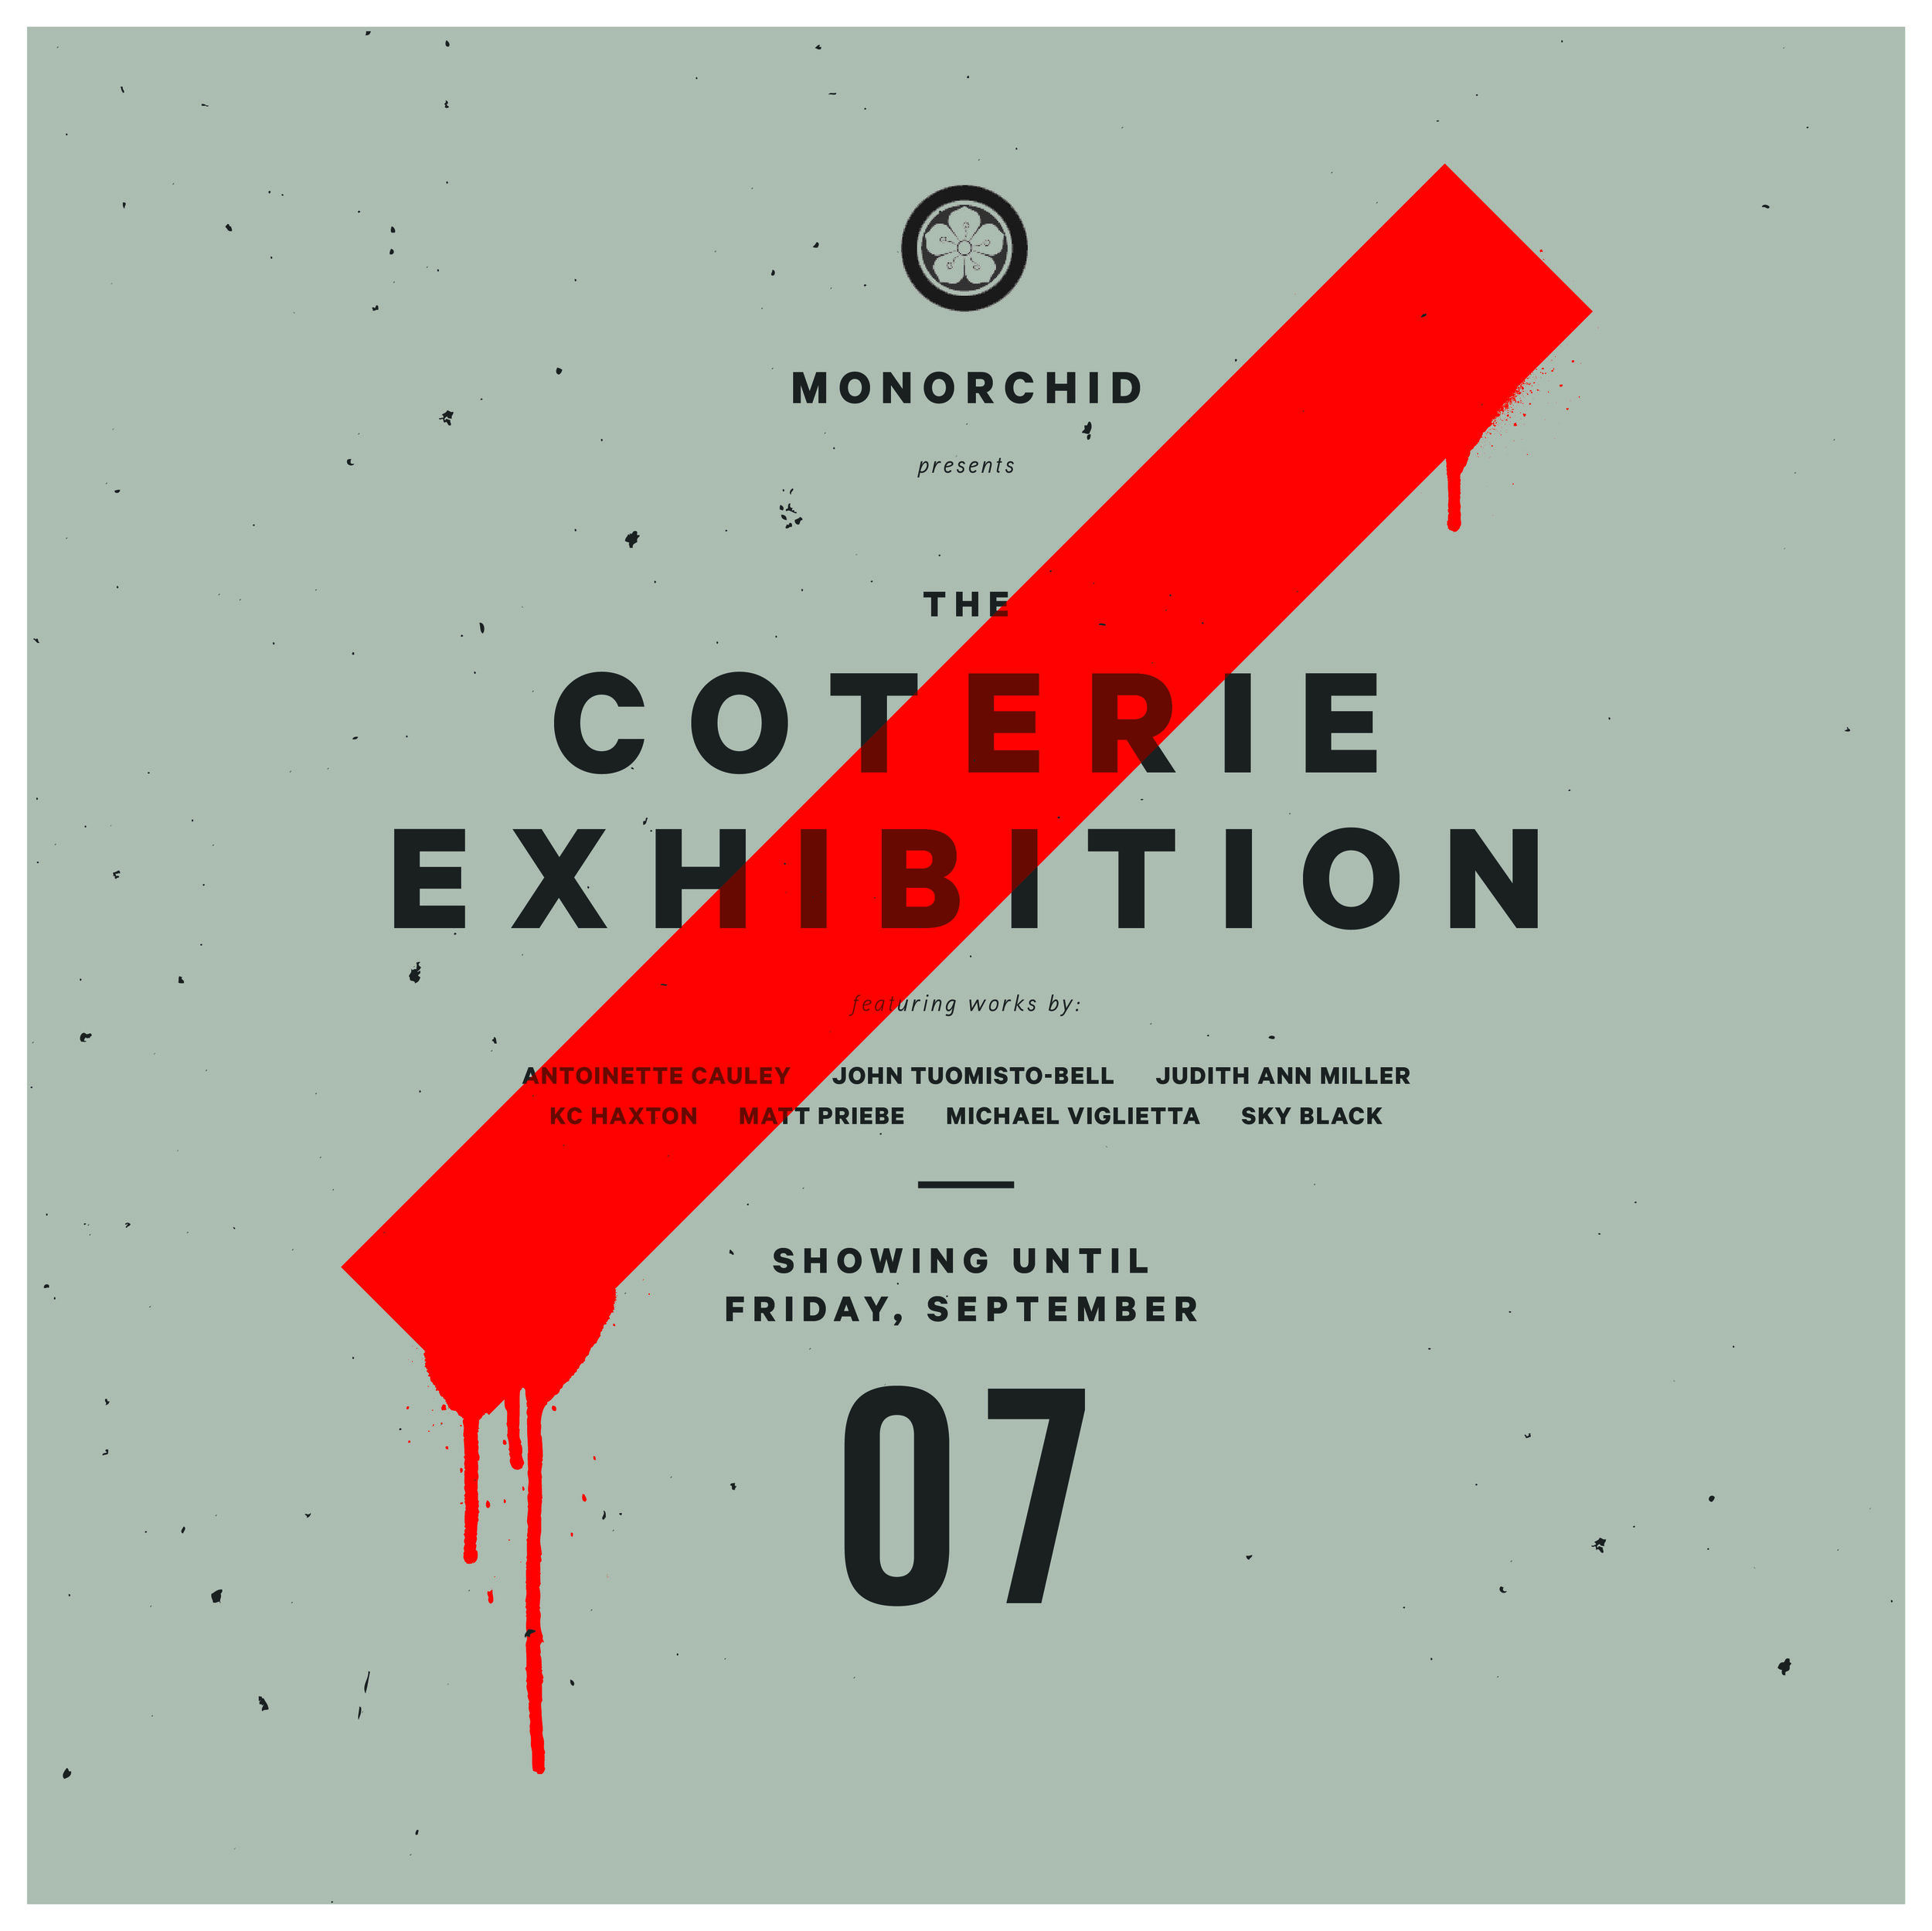 The Coterie Exhibition